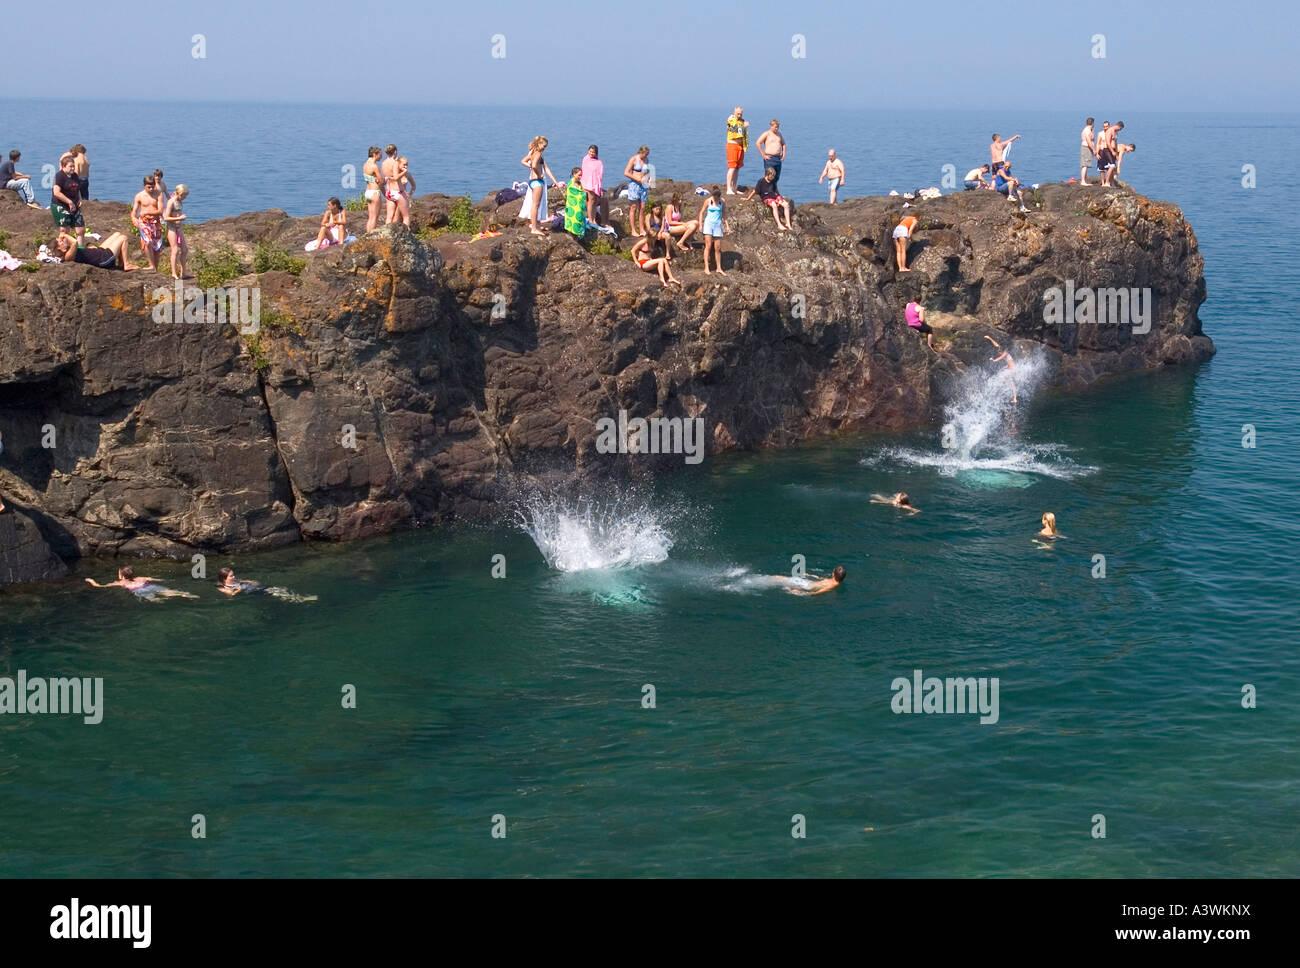 Swimming sunbathing on rocks at Lake Superior, Marquette, Michigan